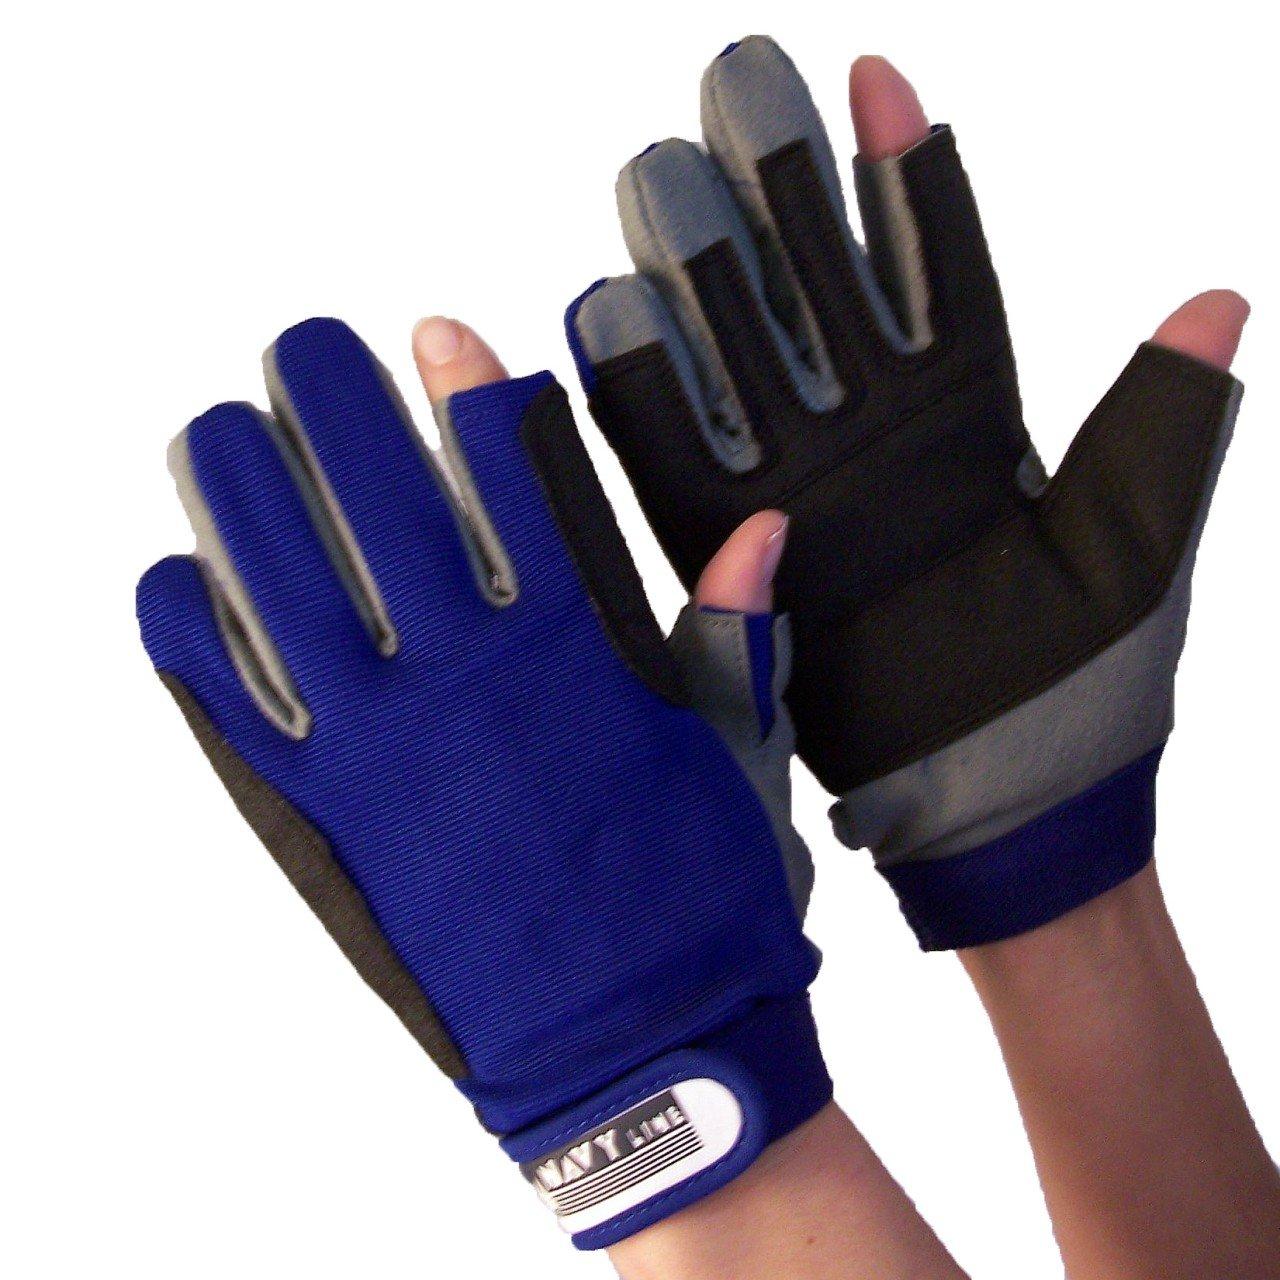 Bekleidung Handschuhe Navyline Segelhandschuhe Amara Kunstleder 2 Finger geschnitten Handschuhe Segeln